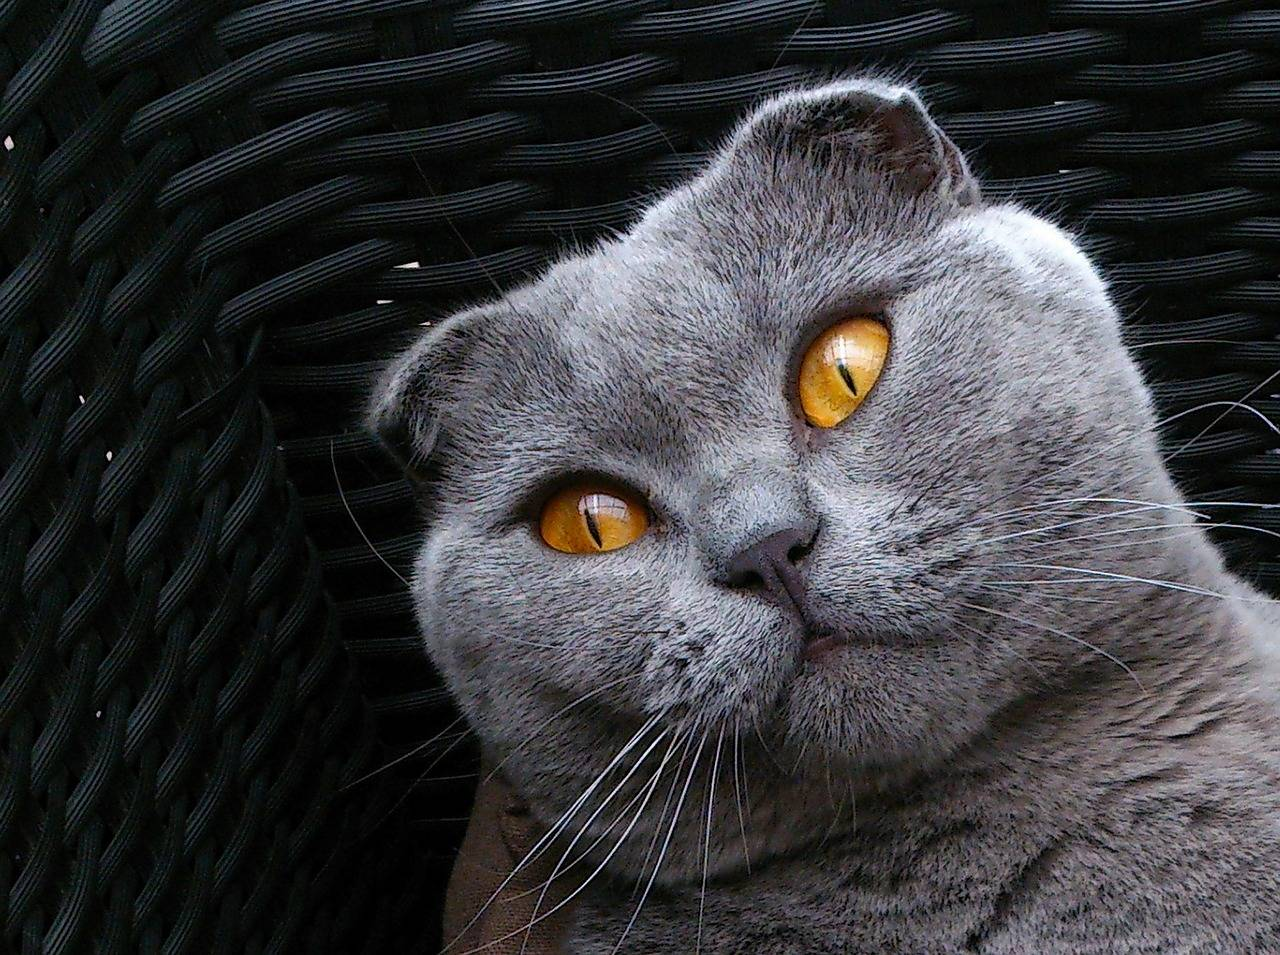 Кот британец вислоухий: характер, фото, содержание и уход